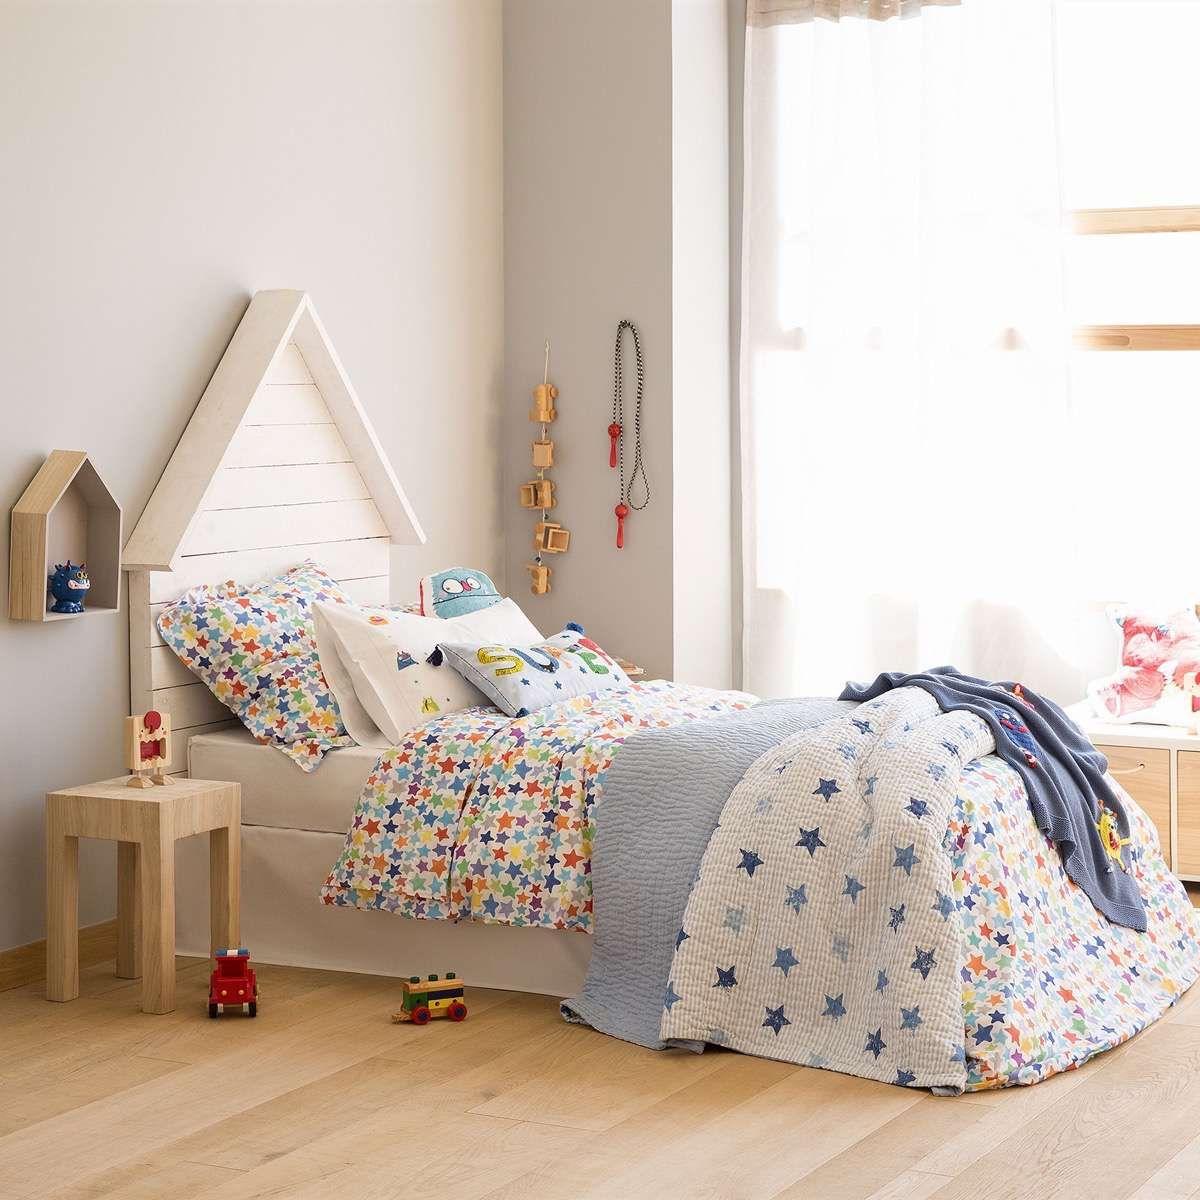 Novedades de zara home kids zara home pinterest room - Ikea ropa de cama colchas ...